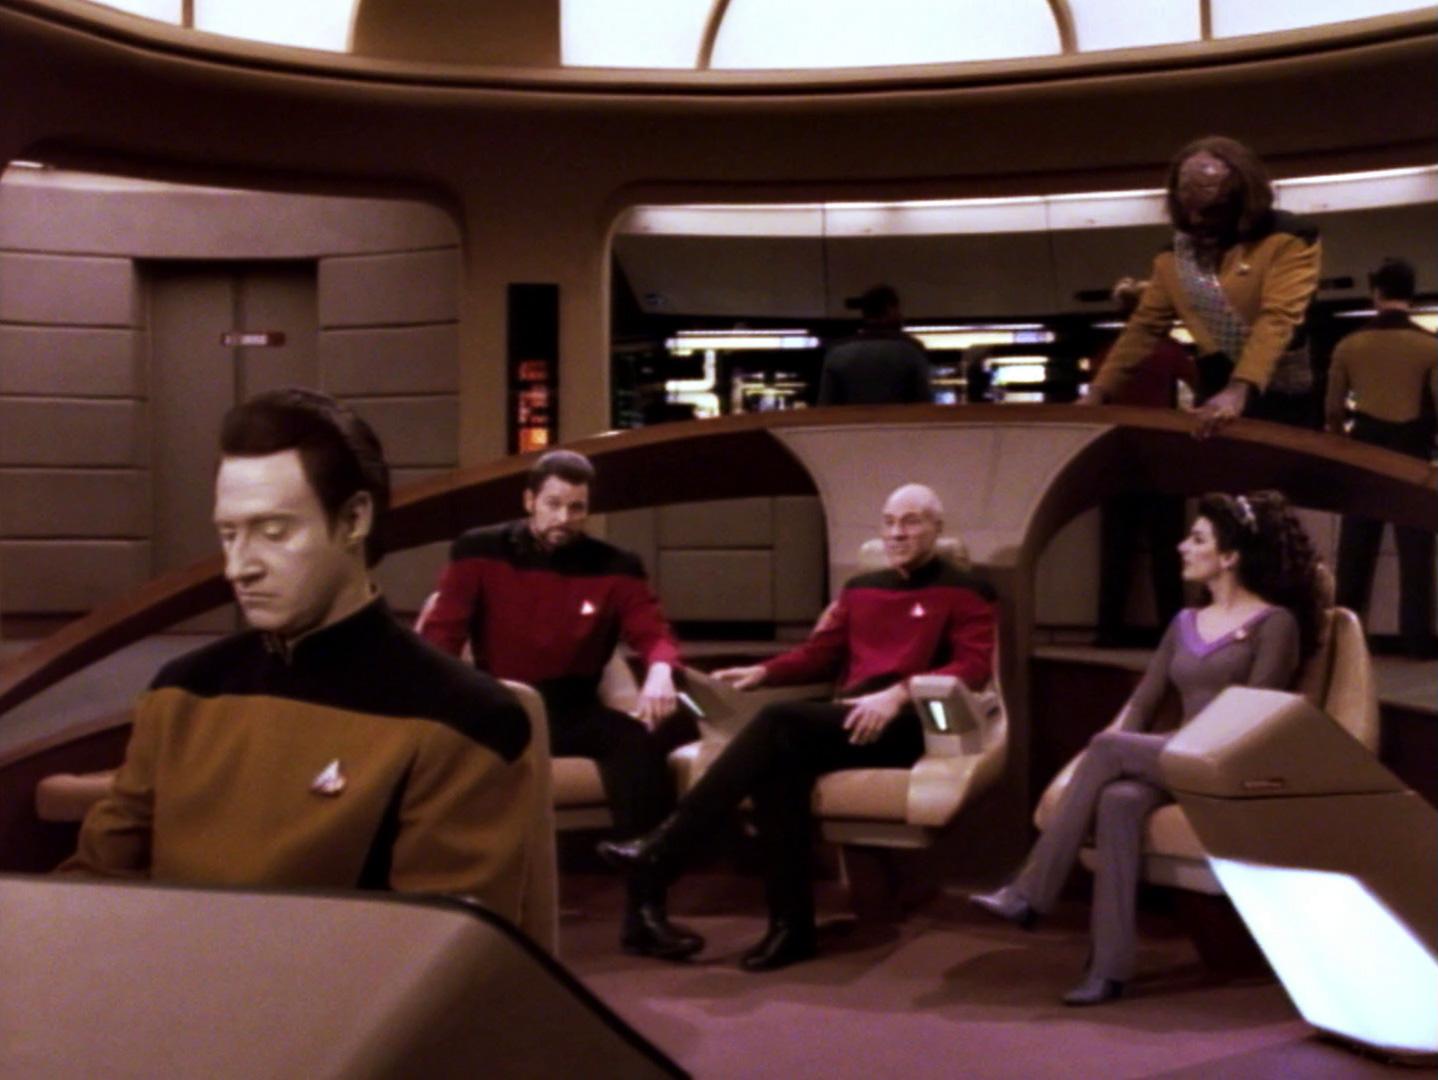 Star Trek Tng Season 2 Torrent